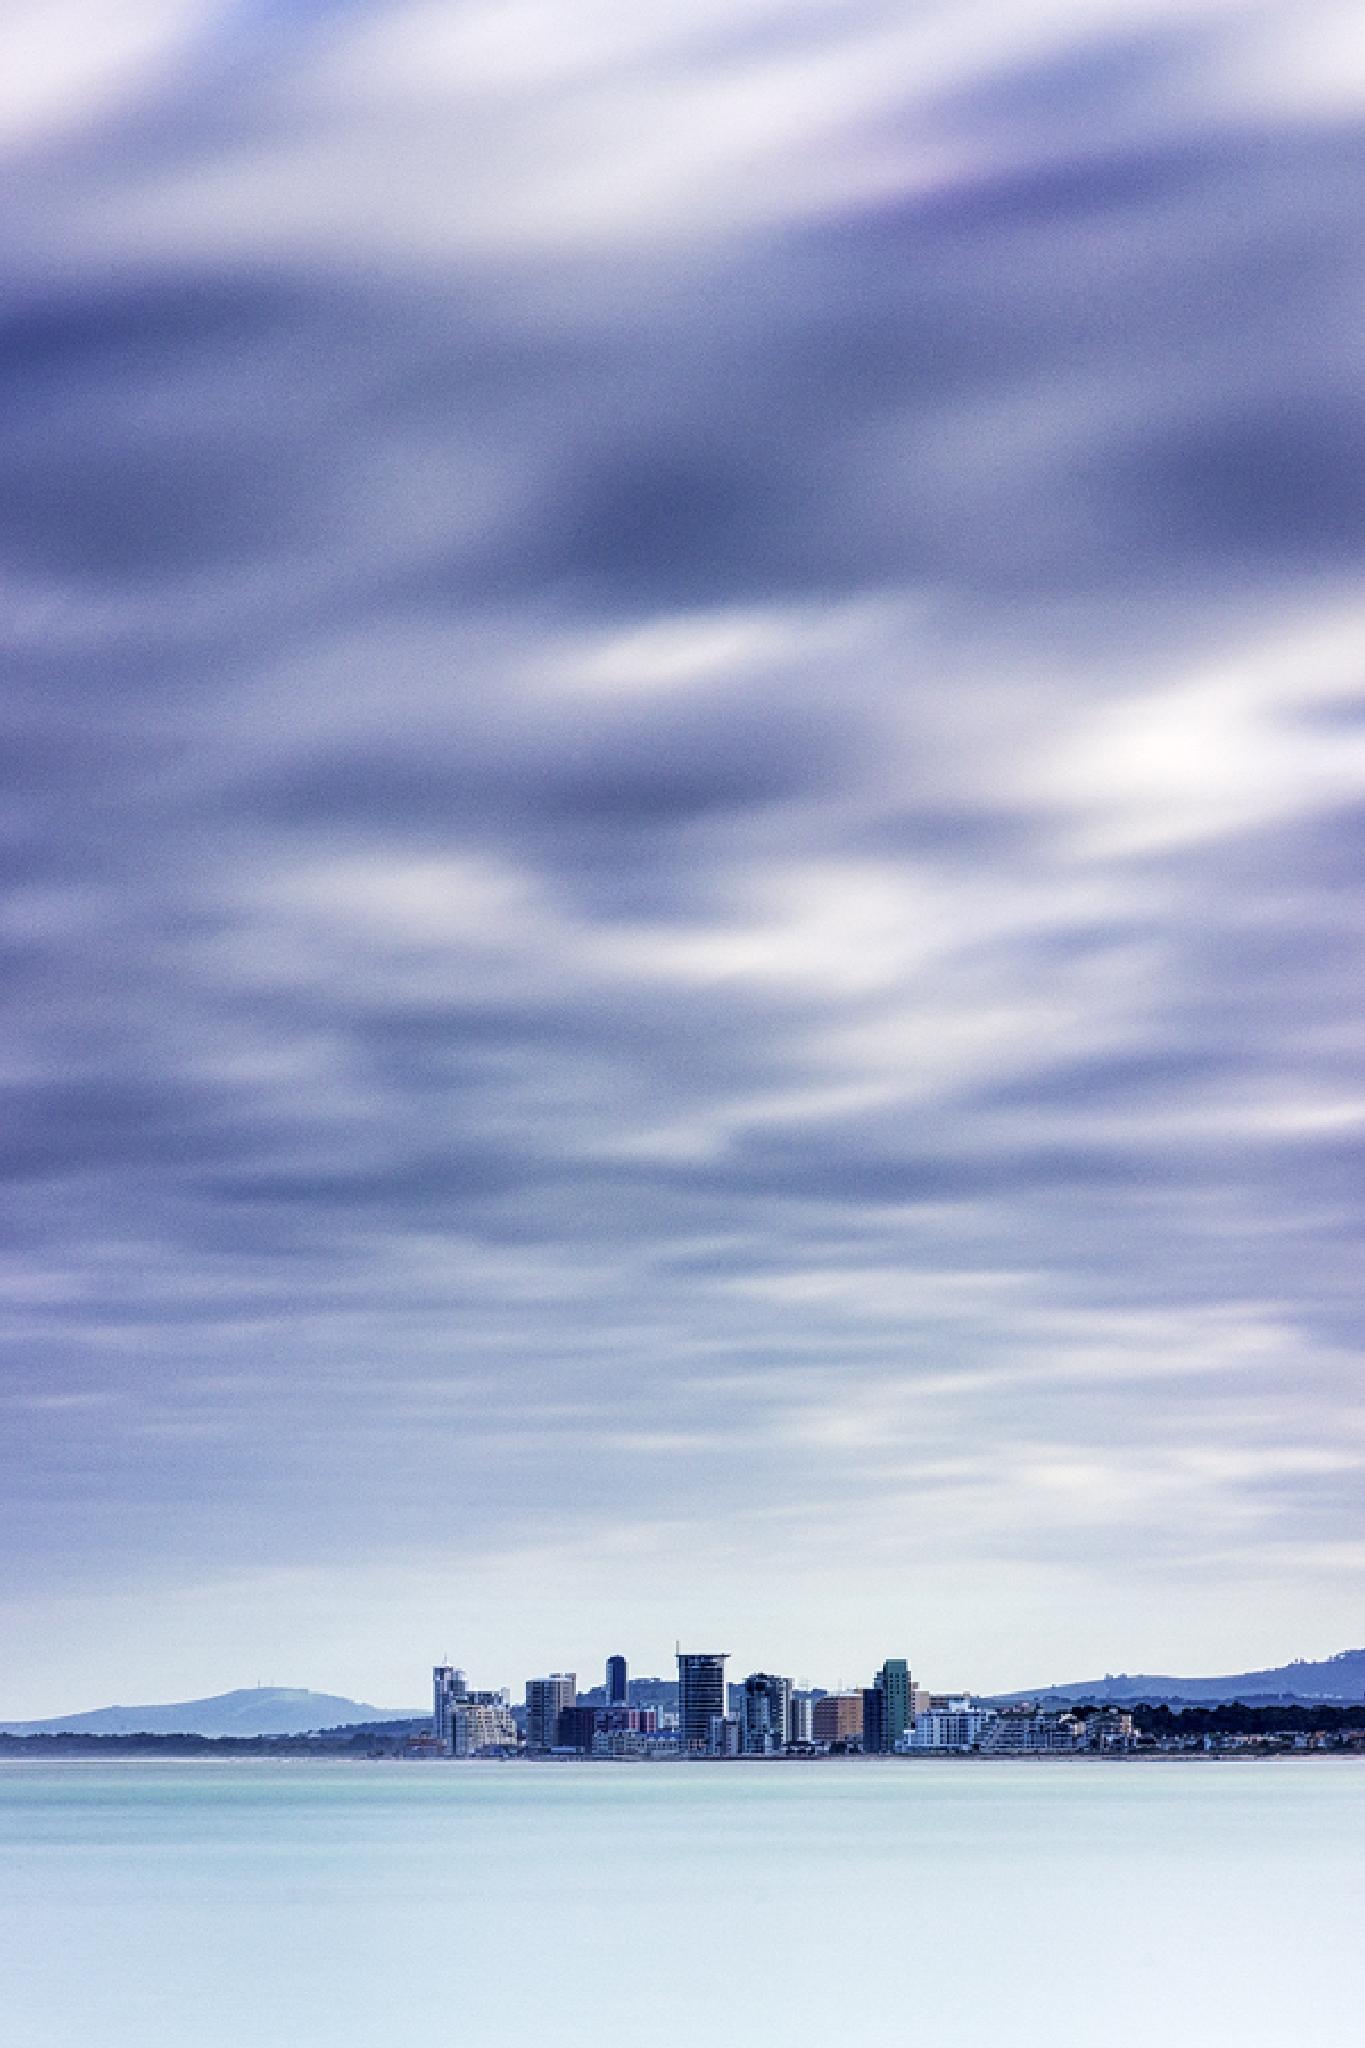 Strand Skyline by arty999